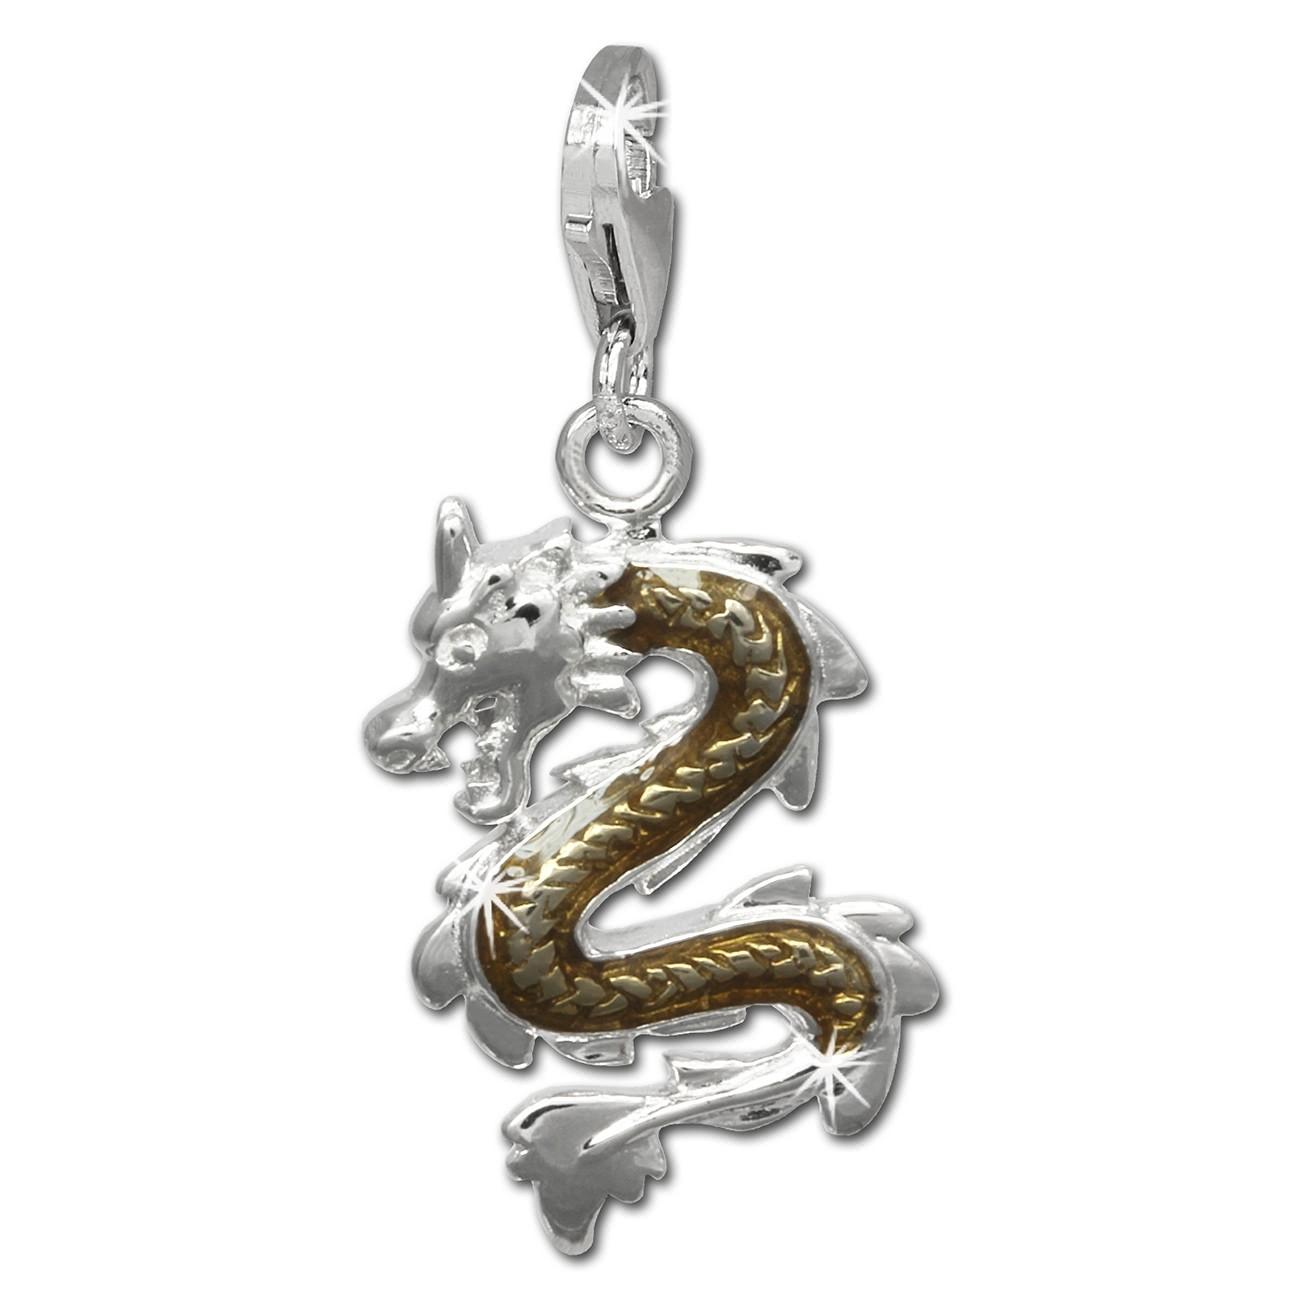 SilberDream Charm Drache 925er Silber Armband Anhänger FC834N